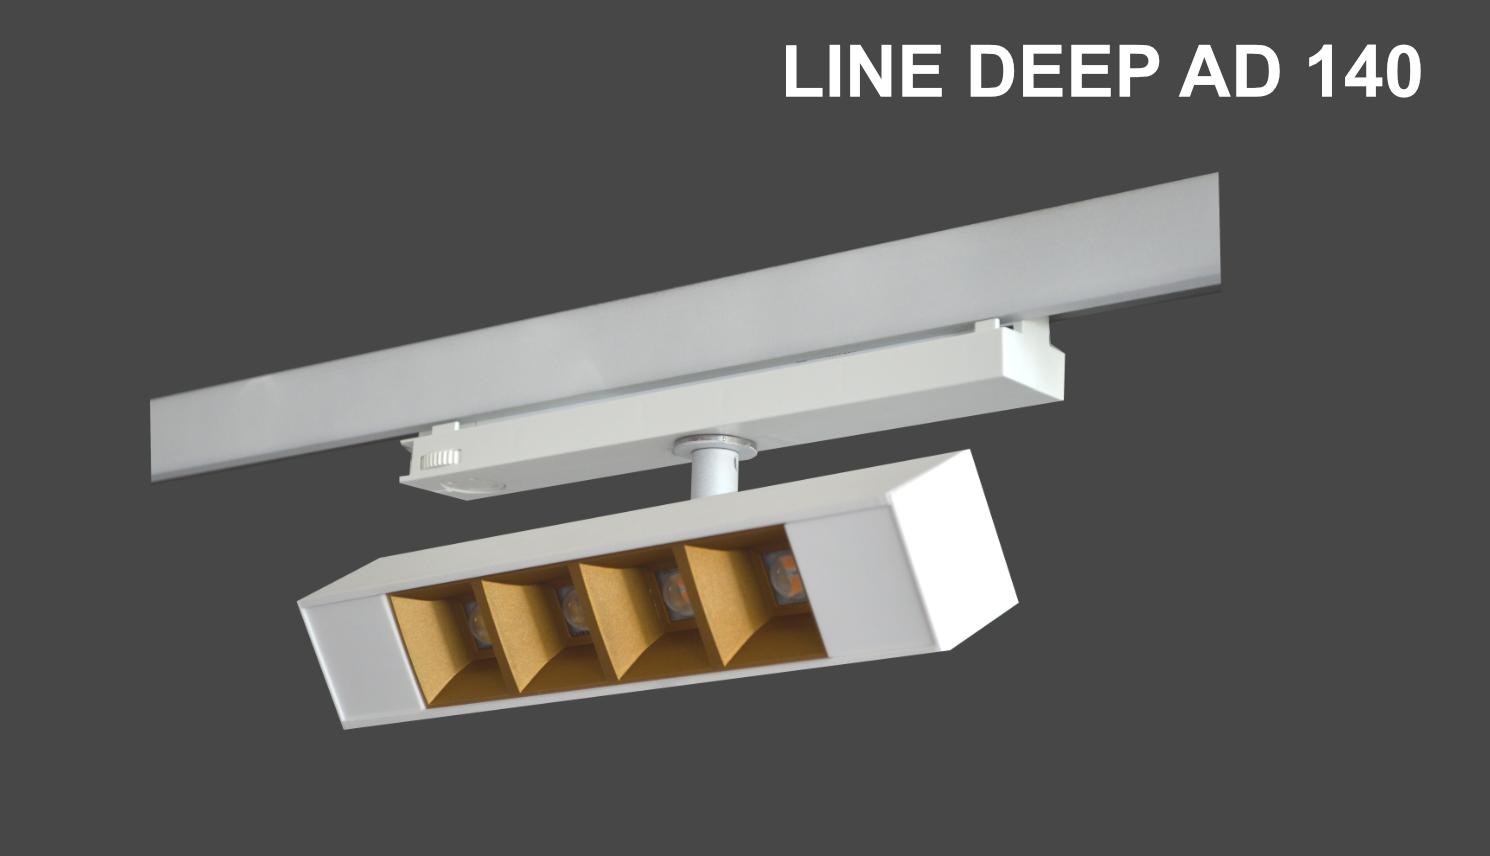 LINE DEEP AD 140